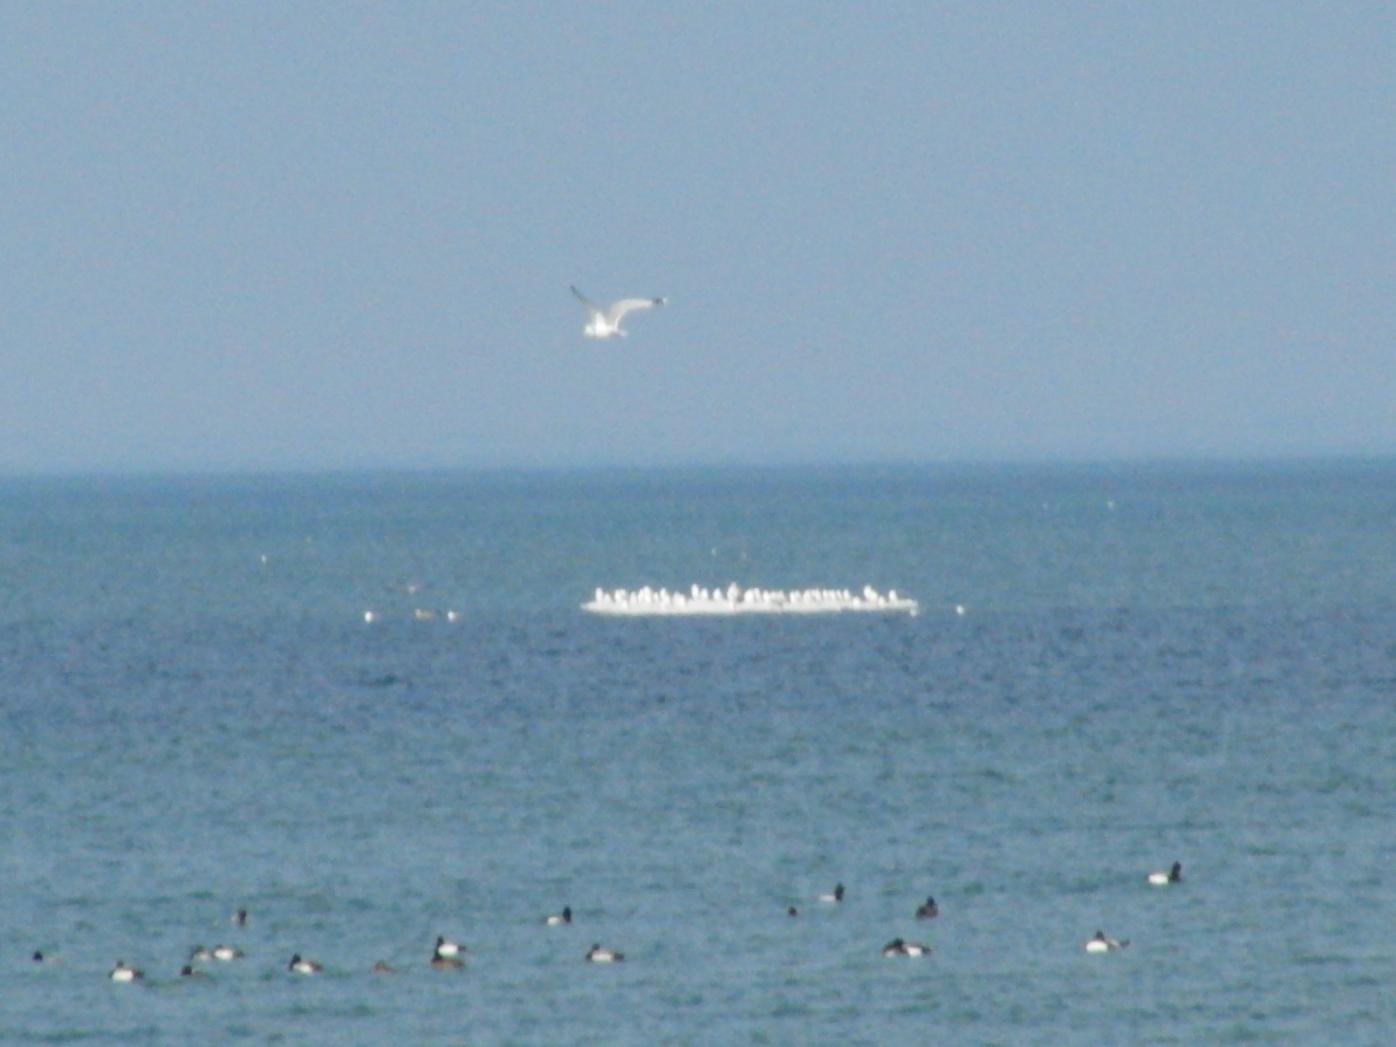 Open water-lake-erie-scaup-gulls-ice-flow-gull-flying-022721-jpg